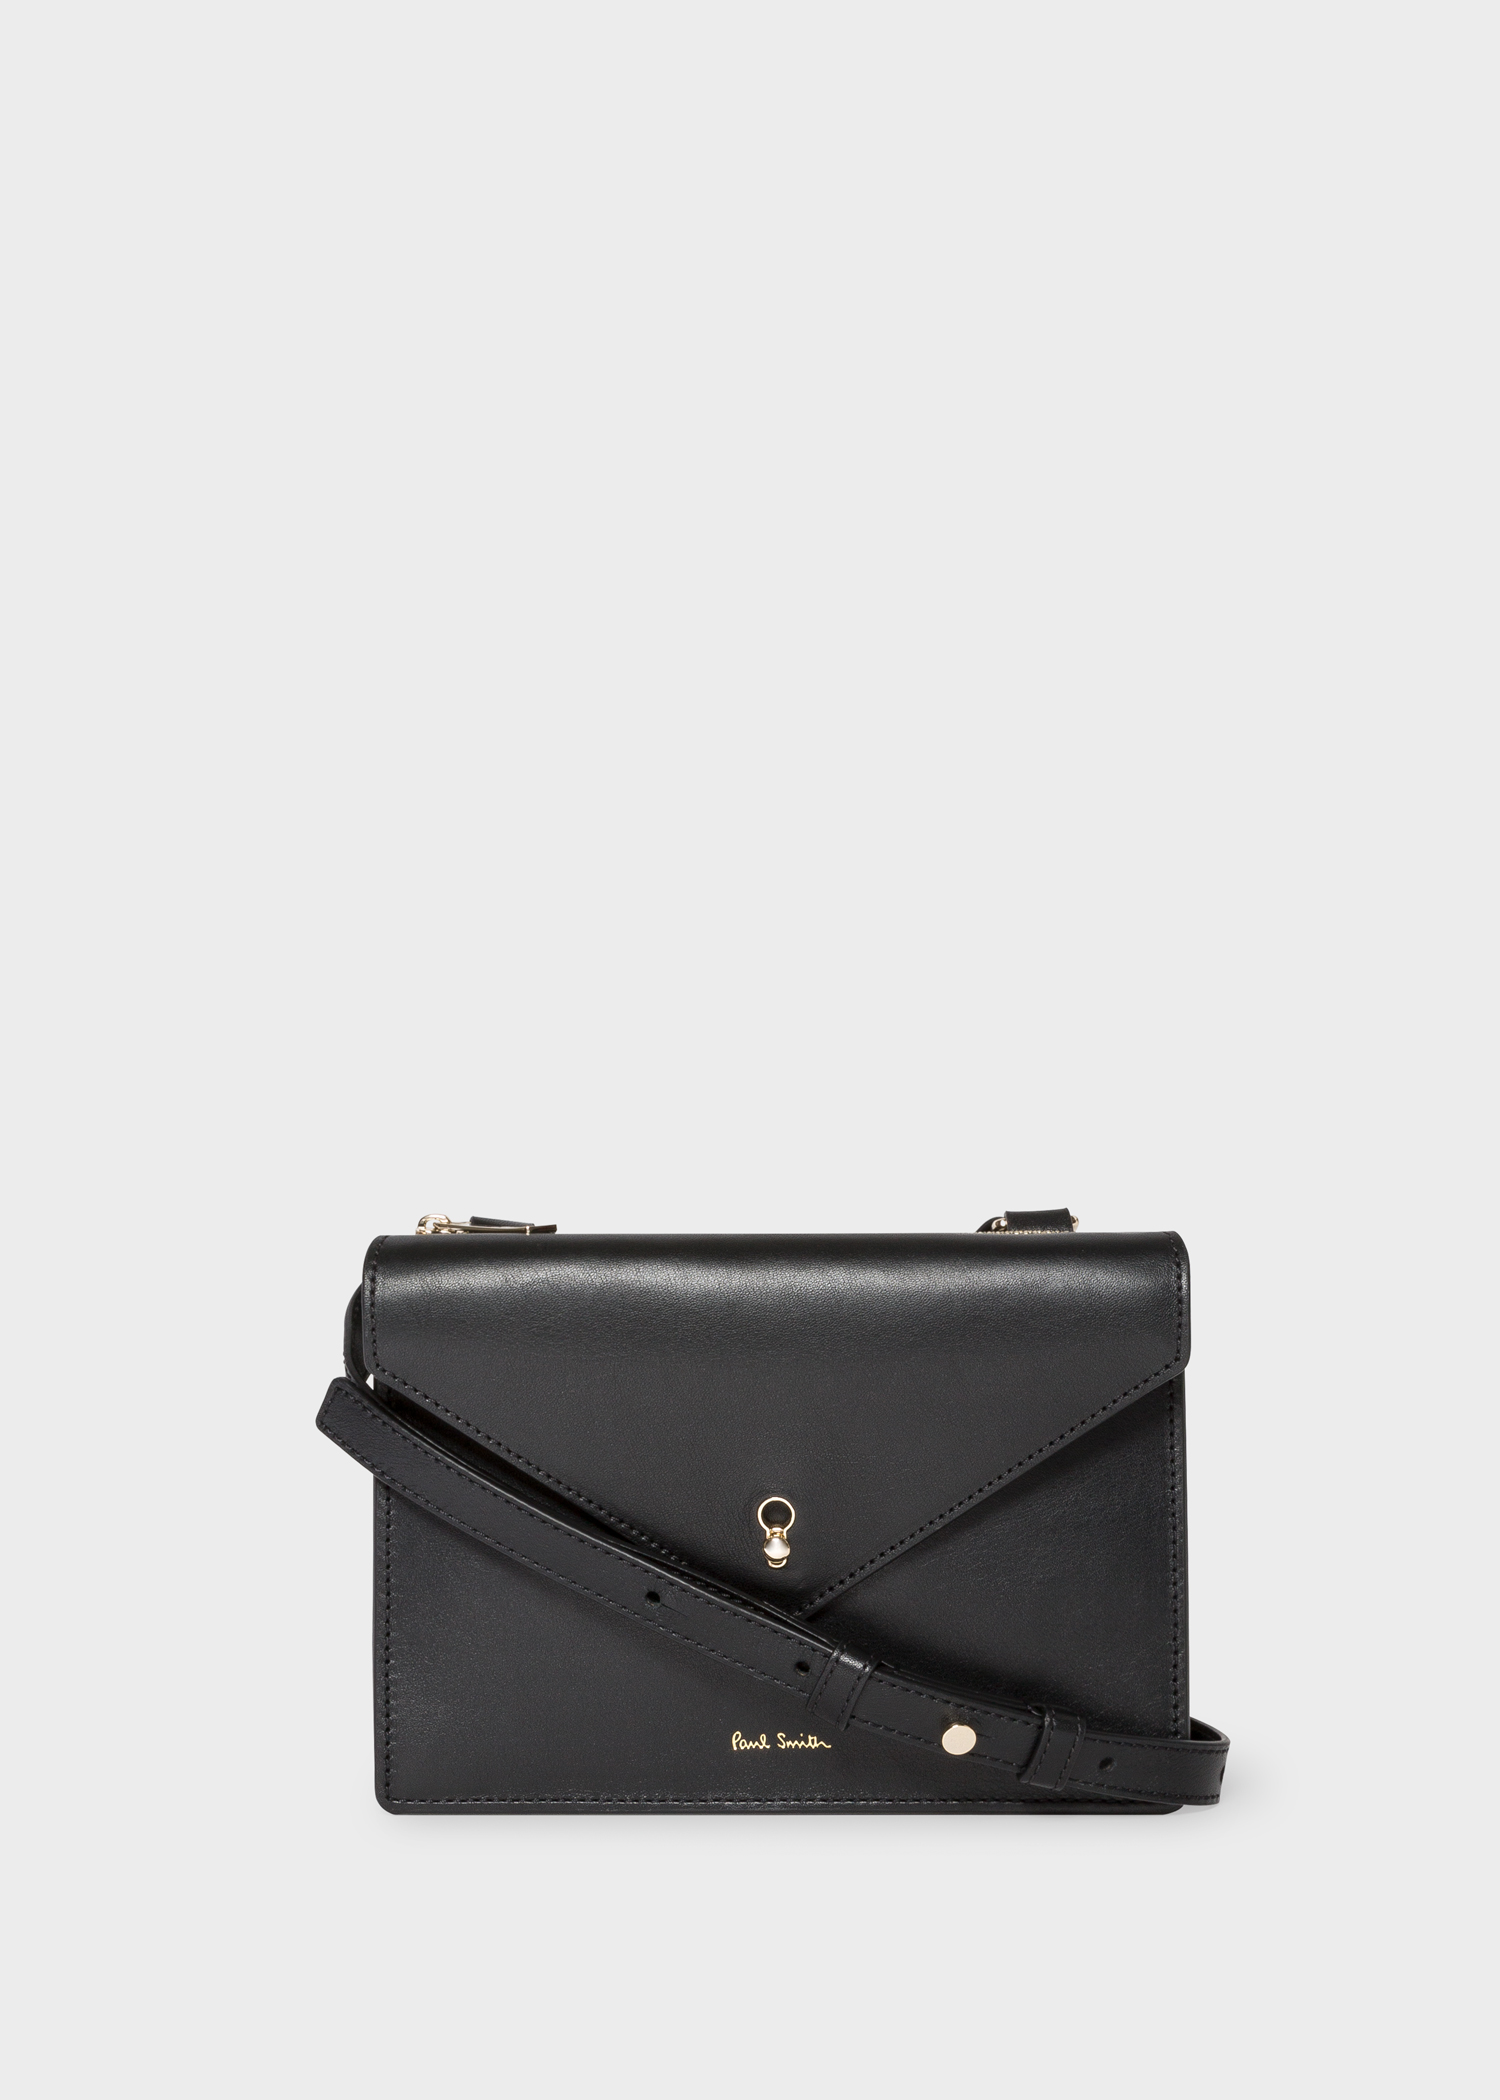 01a62f0b0ba5 Front View - Women s Black Leather Envelope Cross-Body Bag Paul Smith